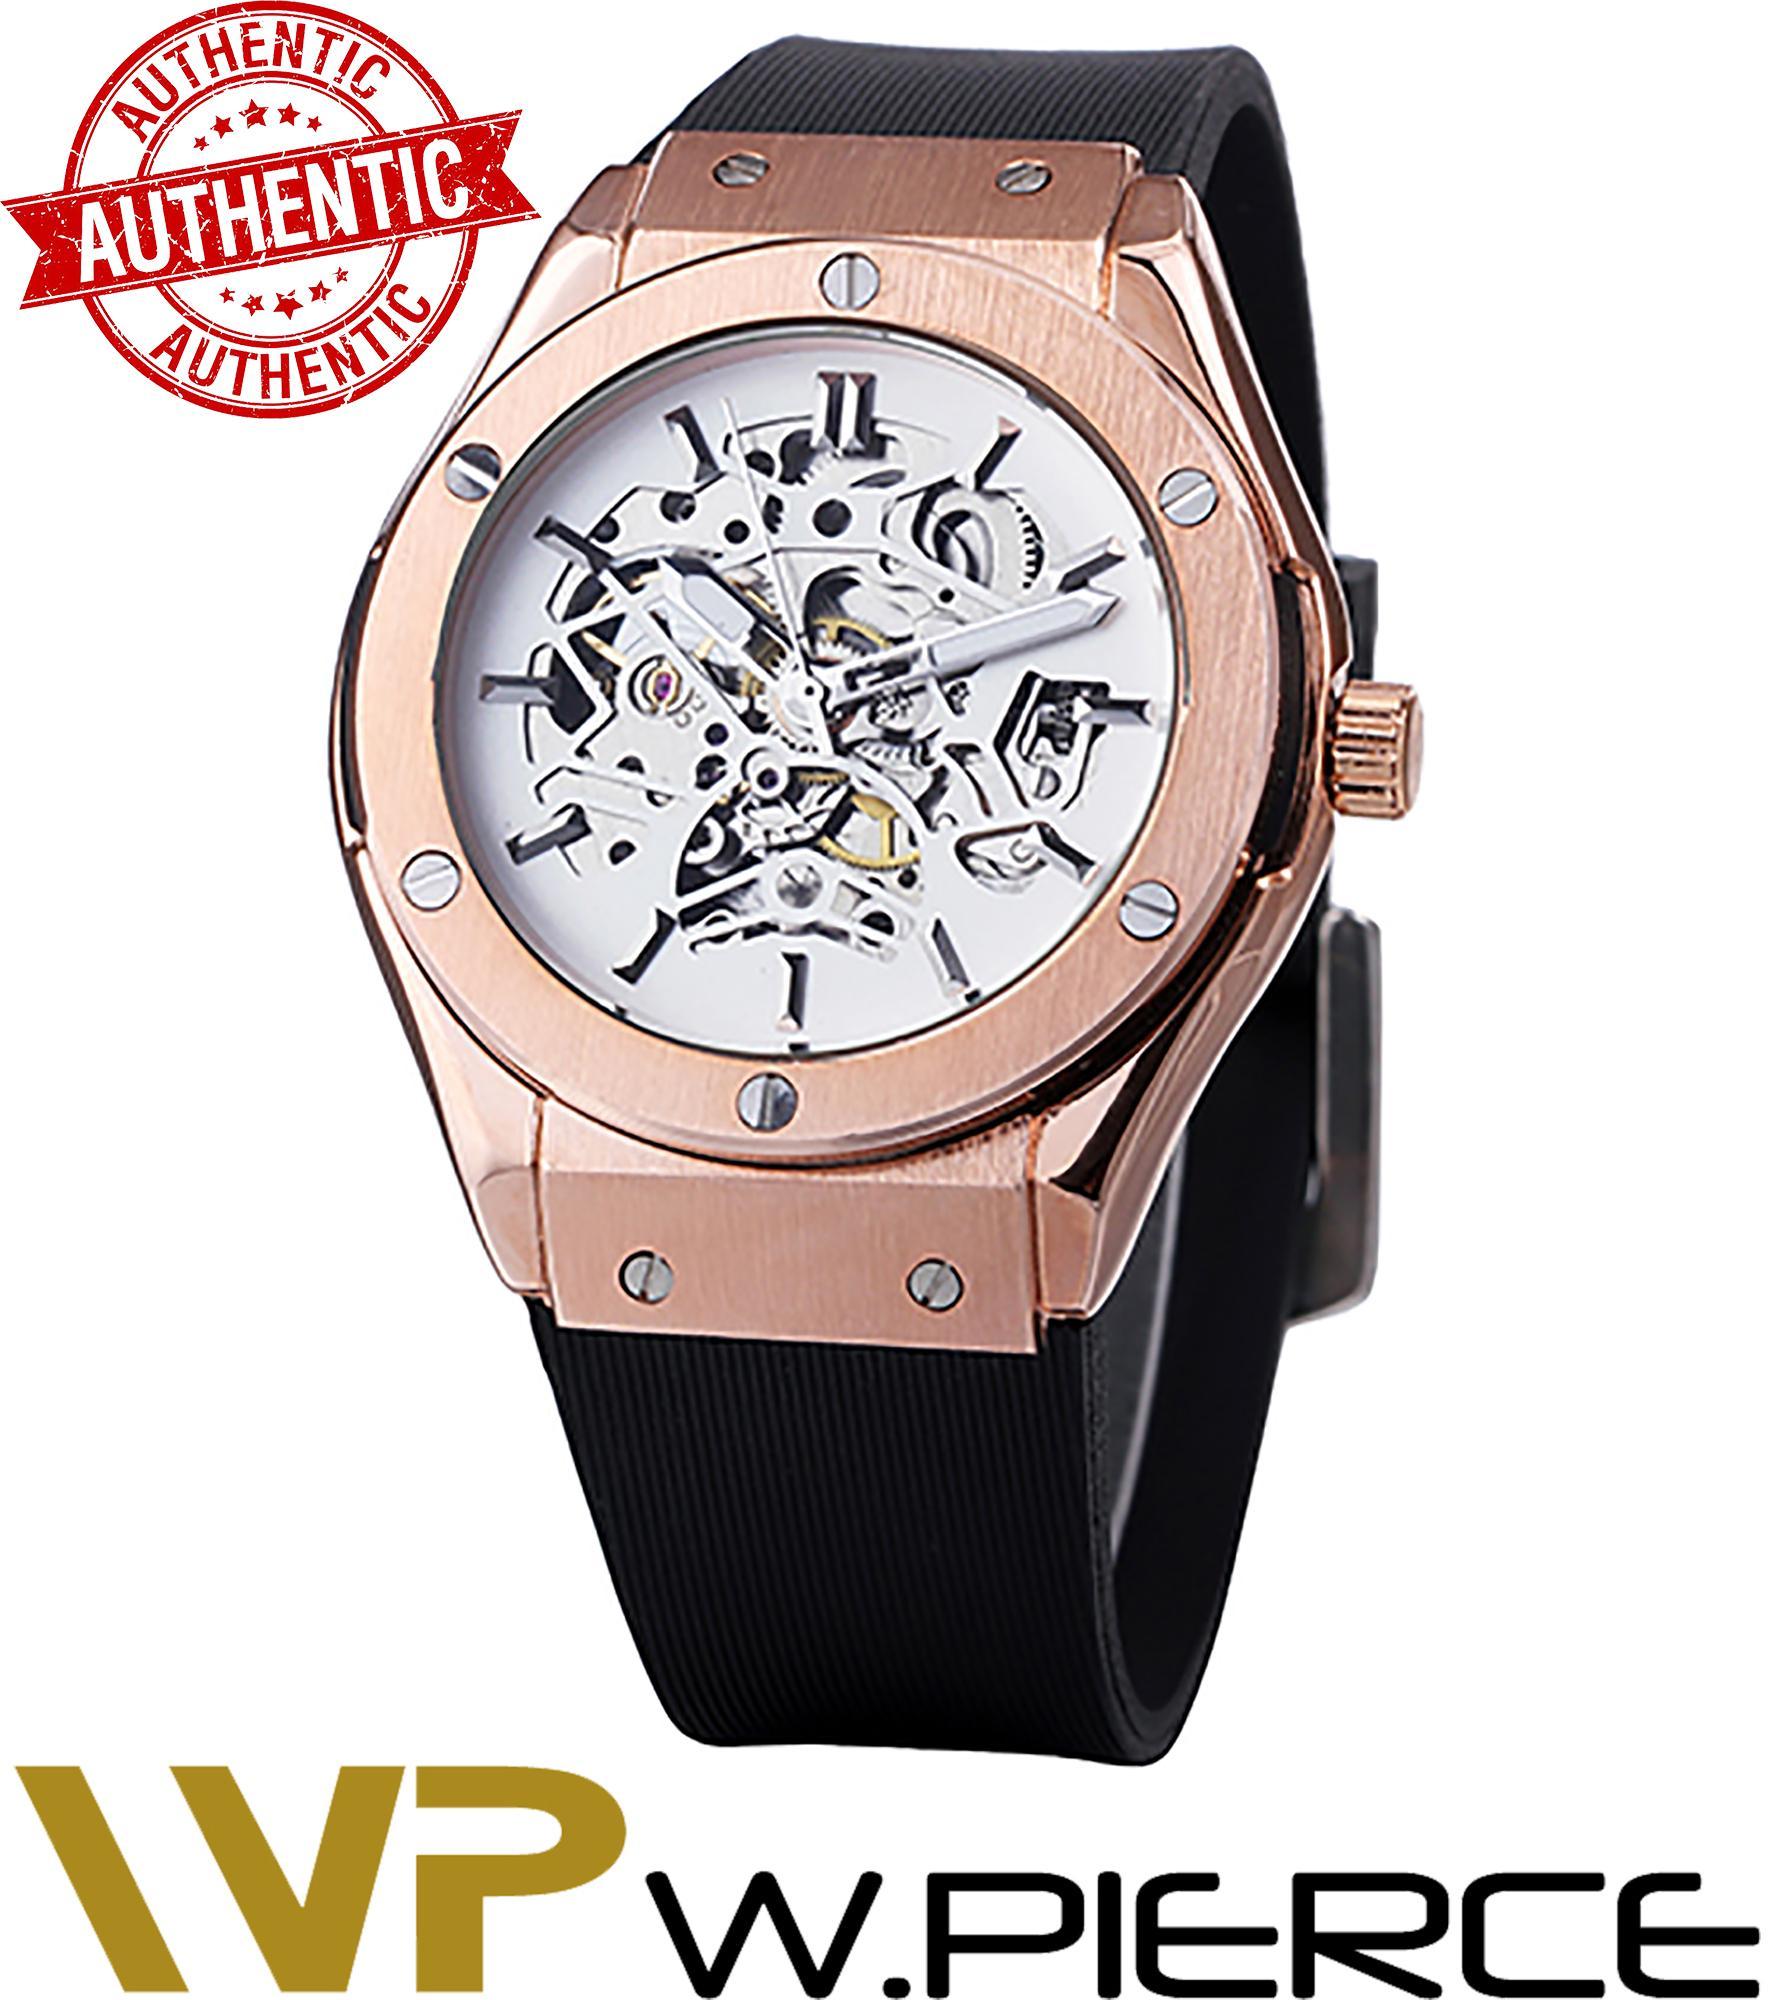 Forsining Philippines Price List Formal Watches For Men Jam Tangan Casio G Shock Dobel Time Tahan Air Black Orange 8107 W Box Wpierce Military 2018 Fashion Auto Mechanical Wristwatch